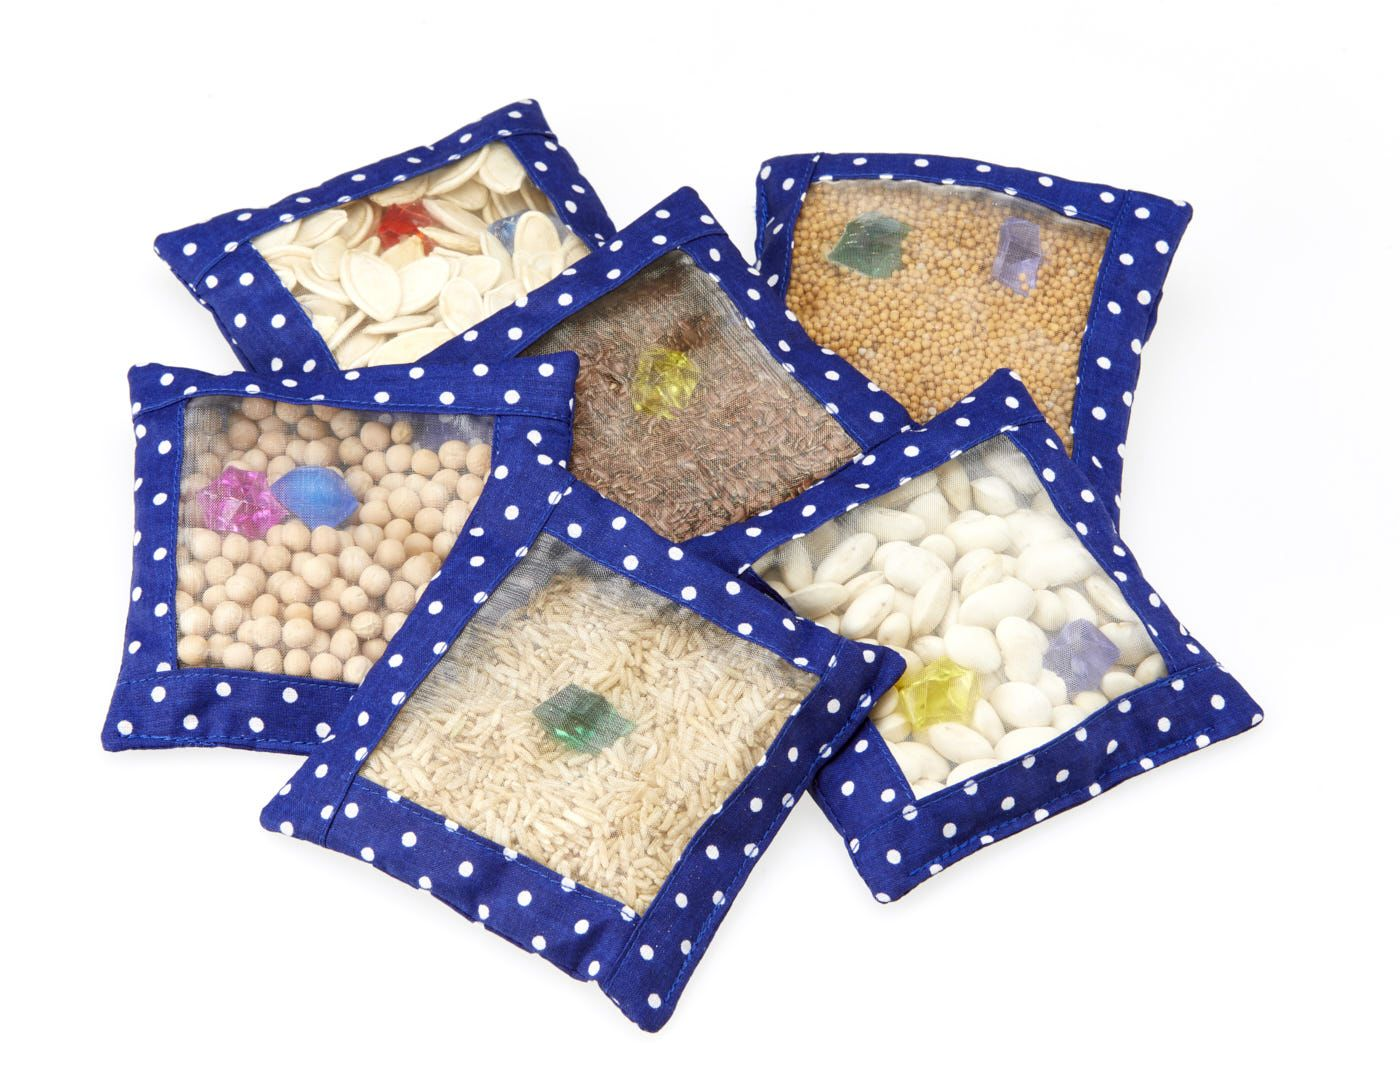 Sensory Discovery Bags, set of 6